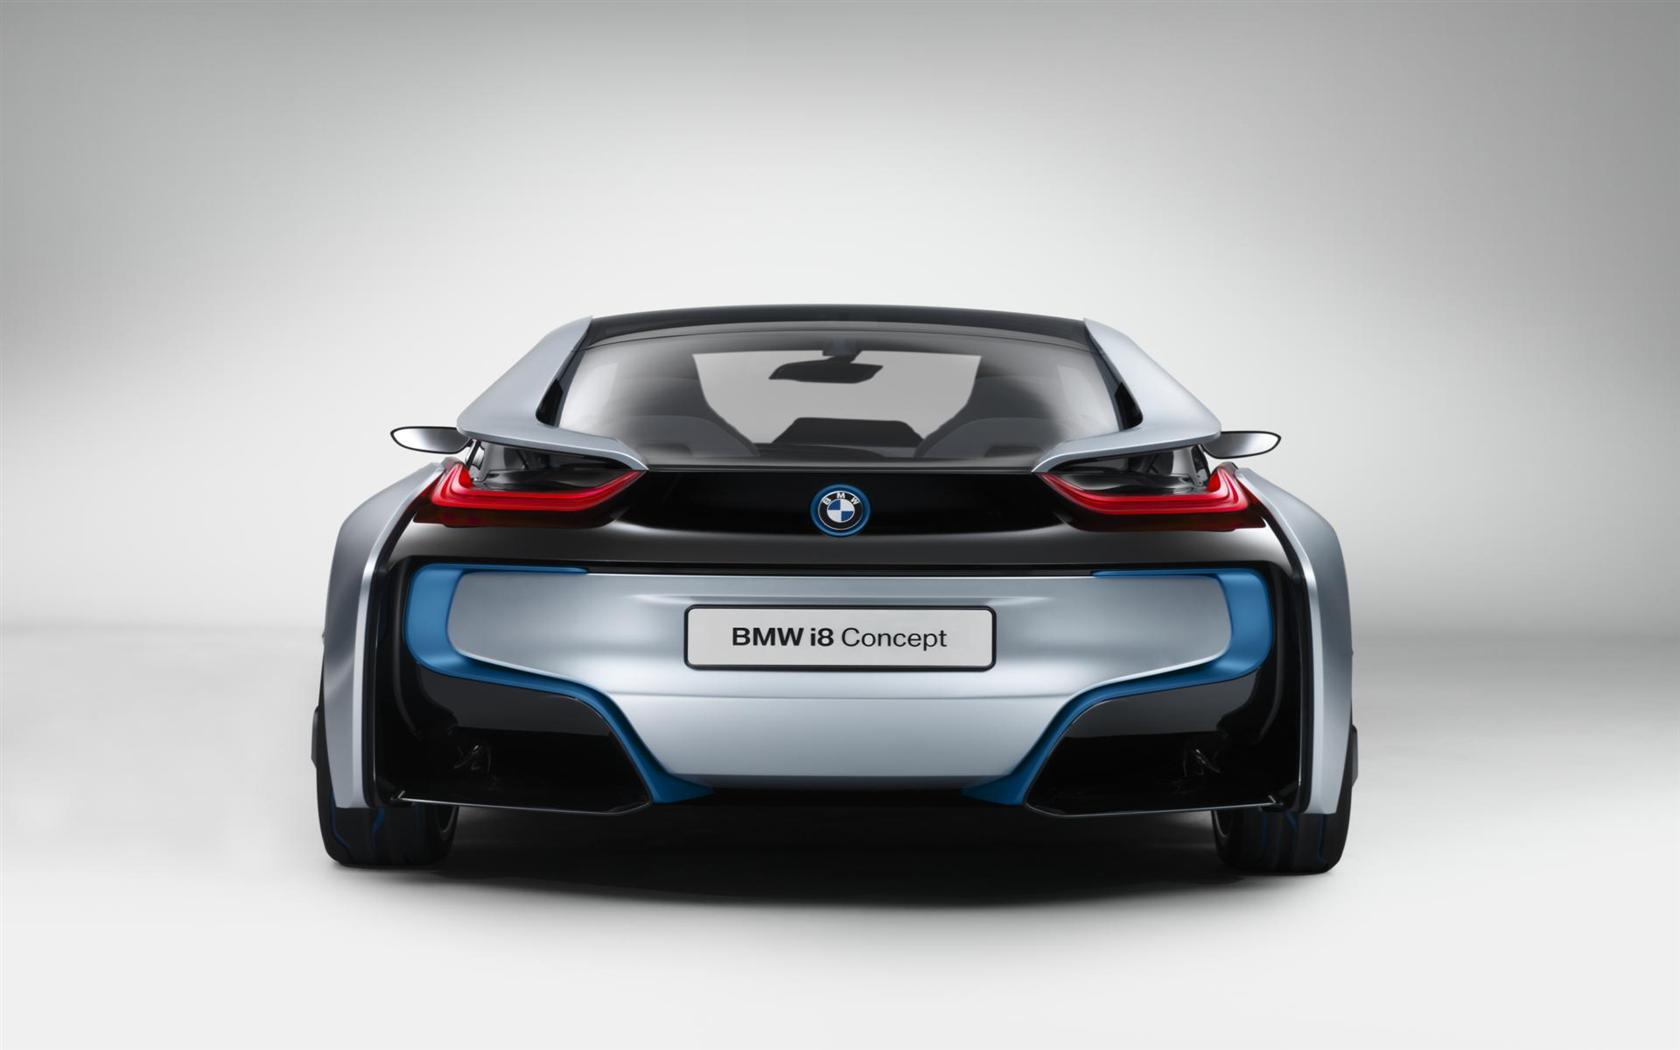 2012 BMW i8 Concept Image. https://www.conceptcarz.com/images/BMW ...